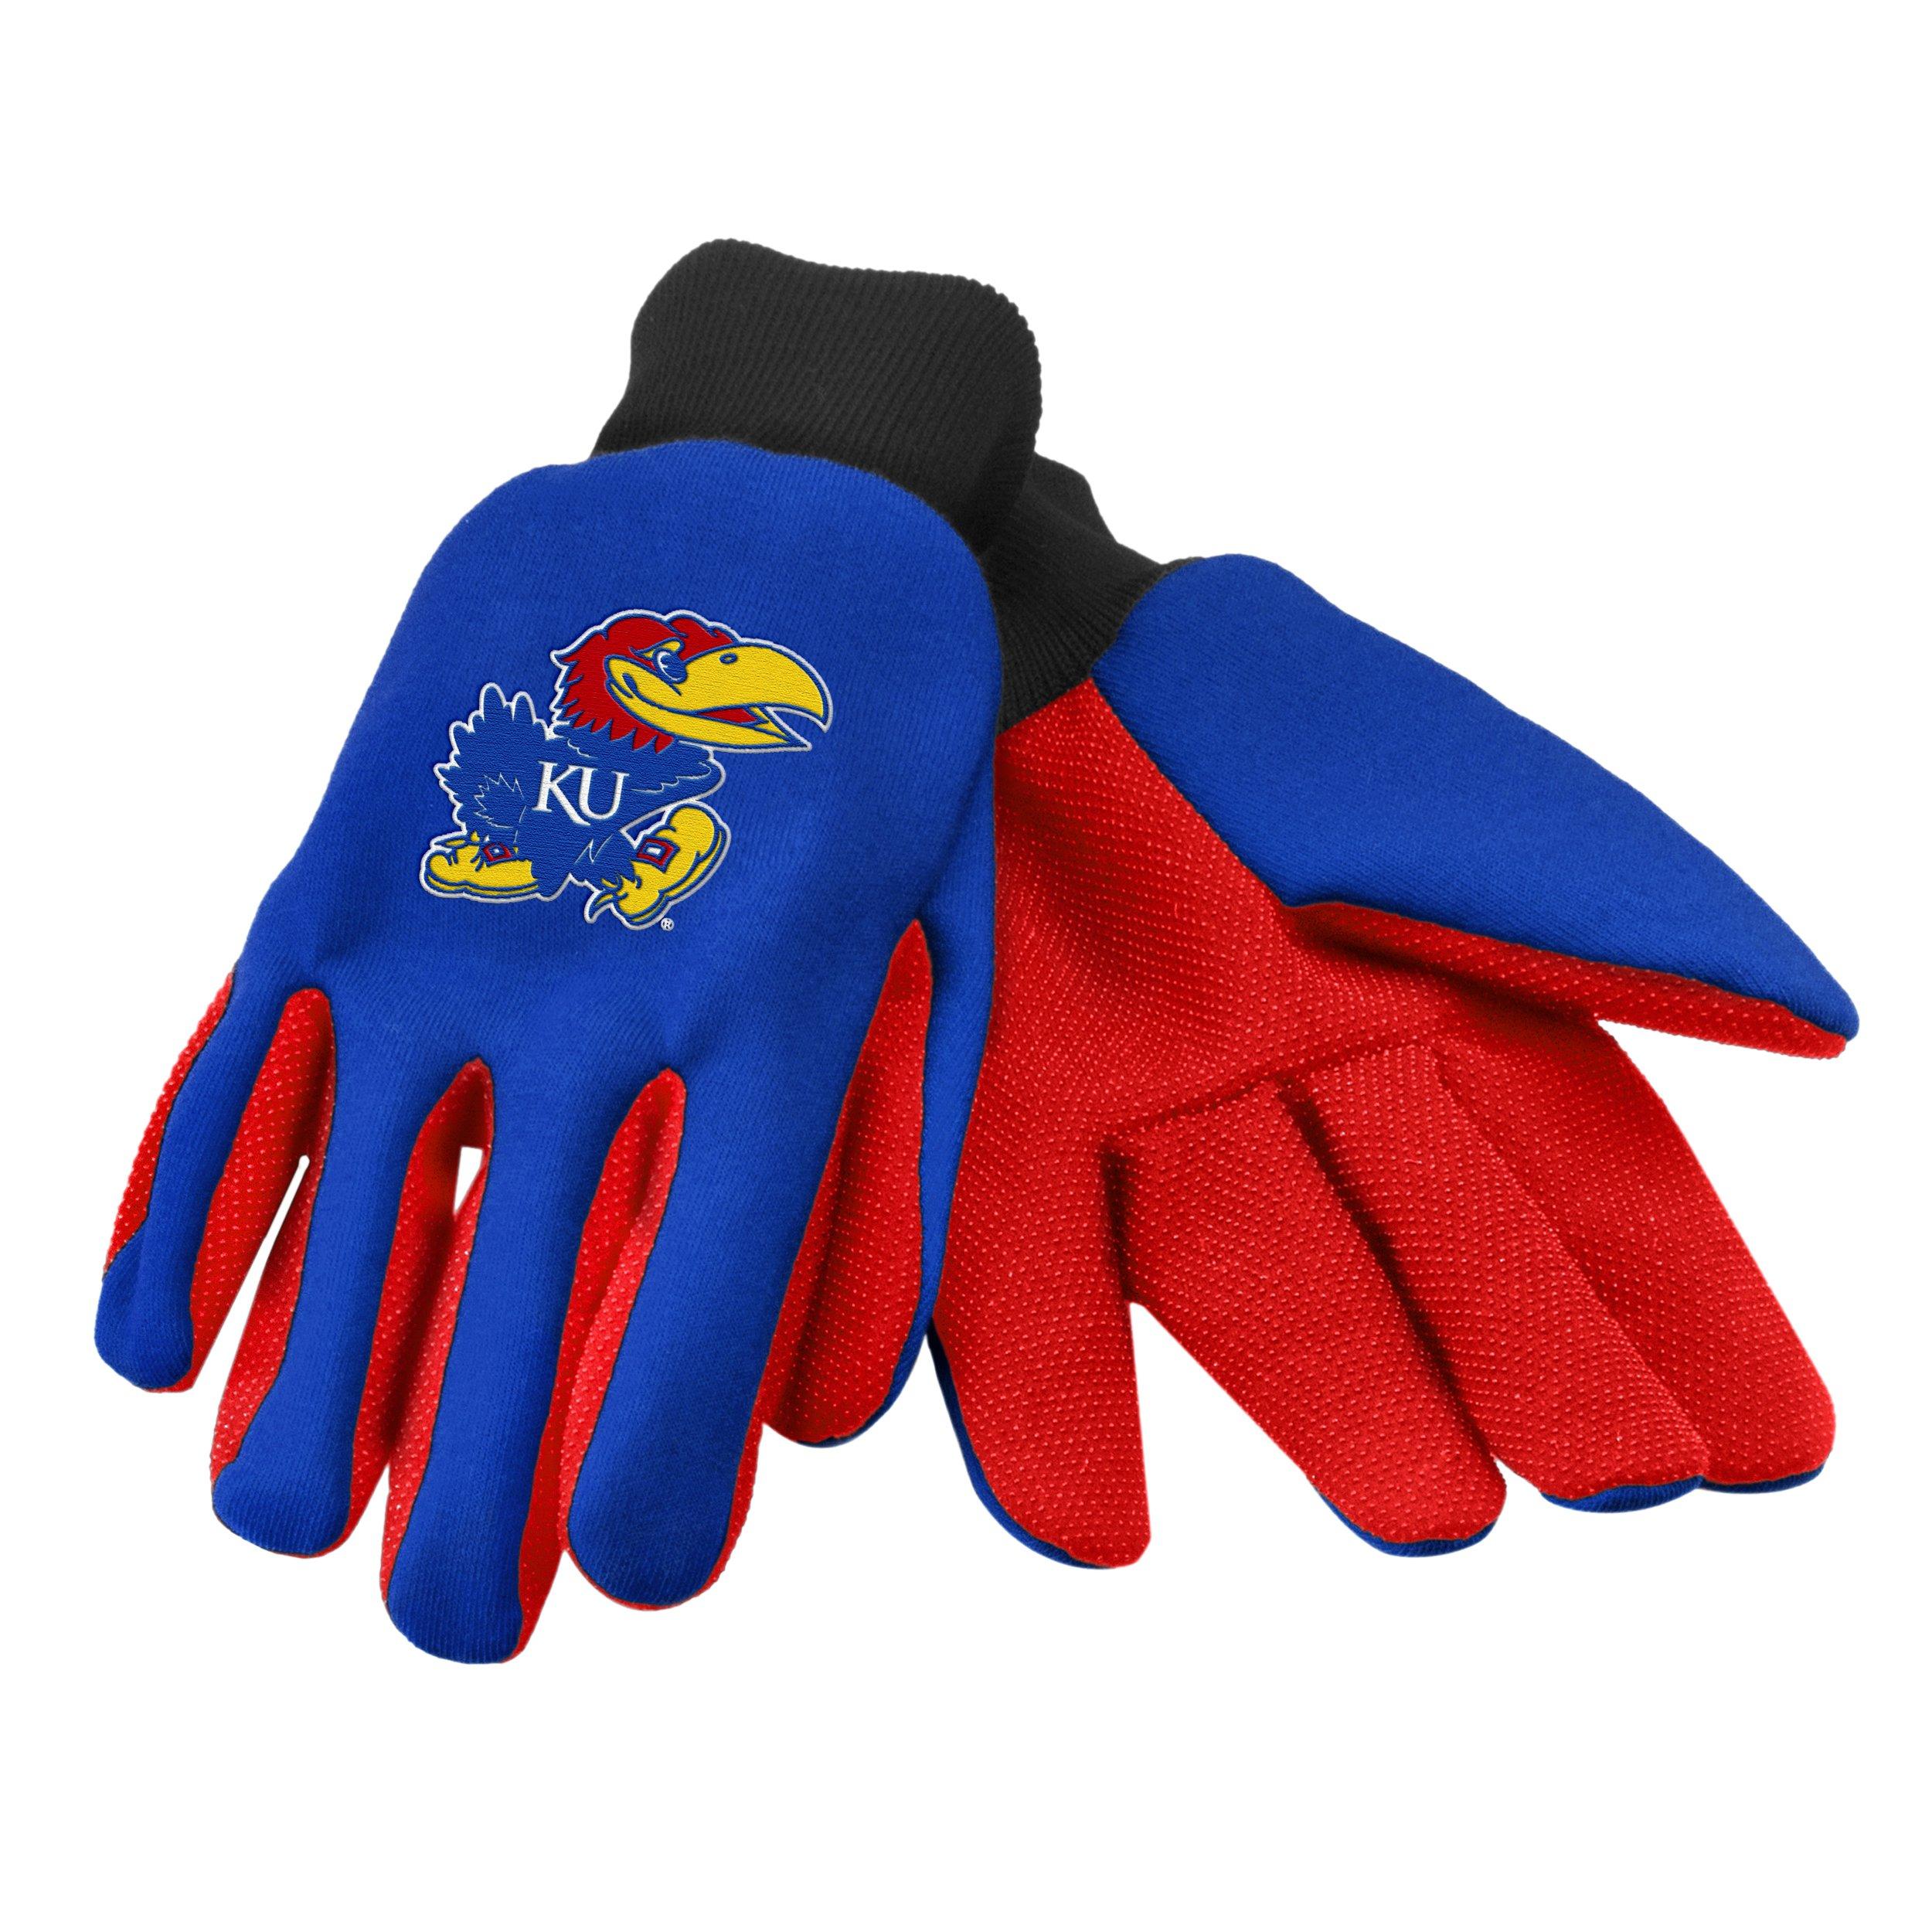 Kansas 2015 Utility Glove - Colored Palm